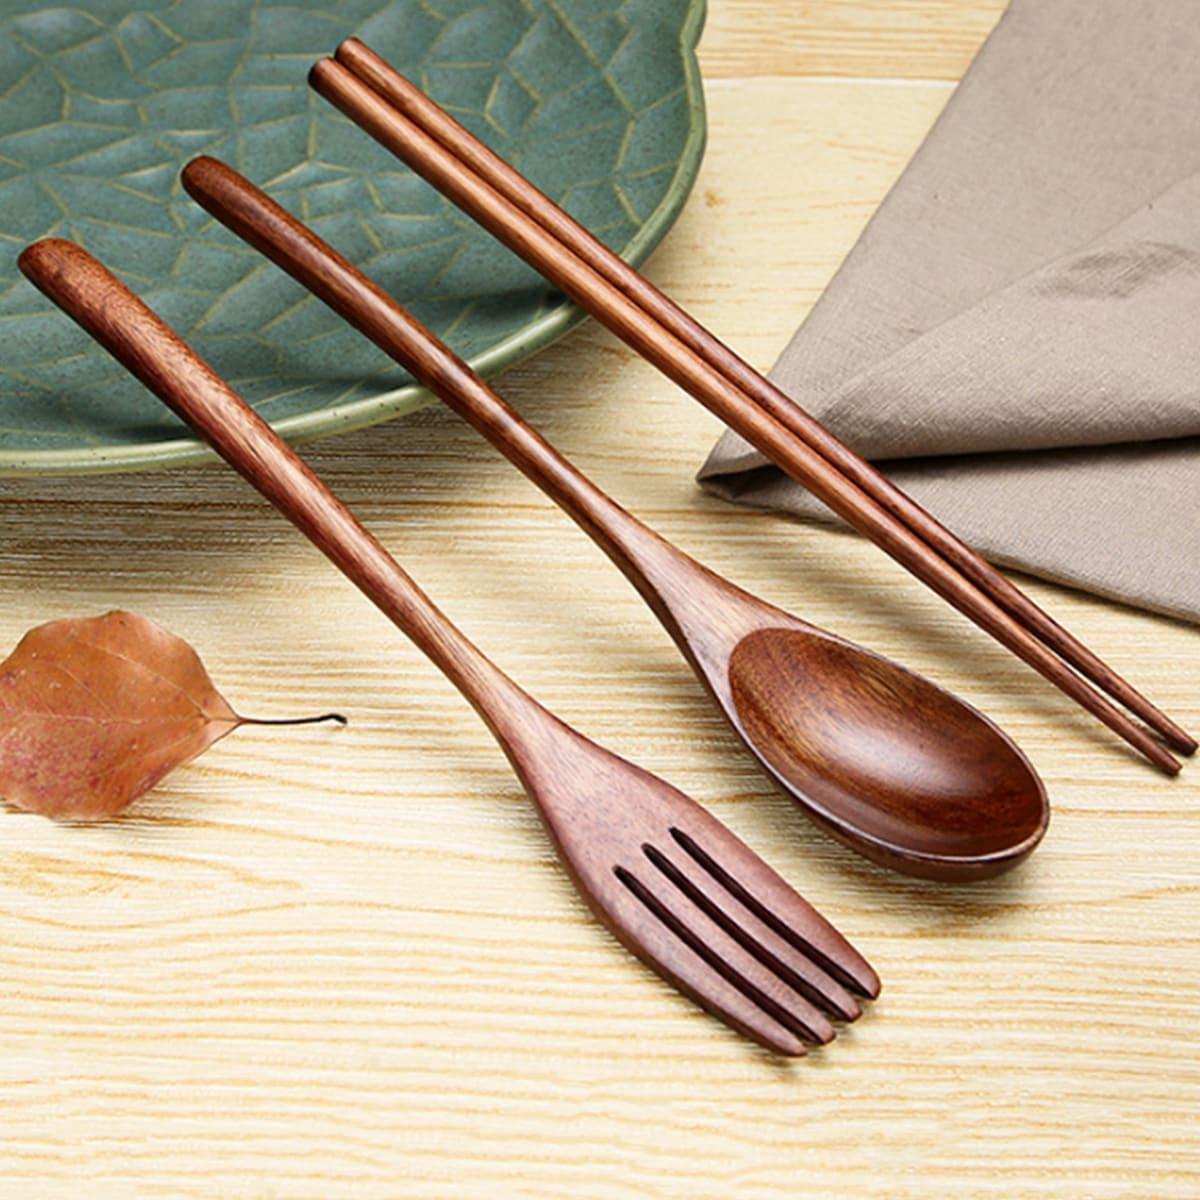 1 Stück Holzlöffel & 1 Paar Essstäbchen & 1 Stück Gabel